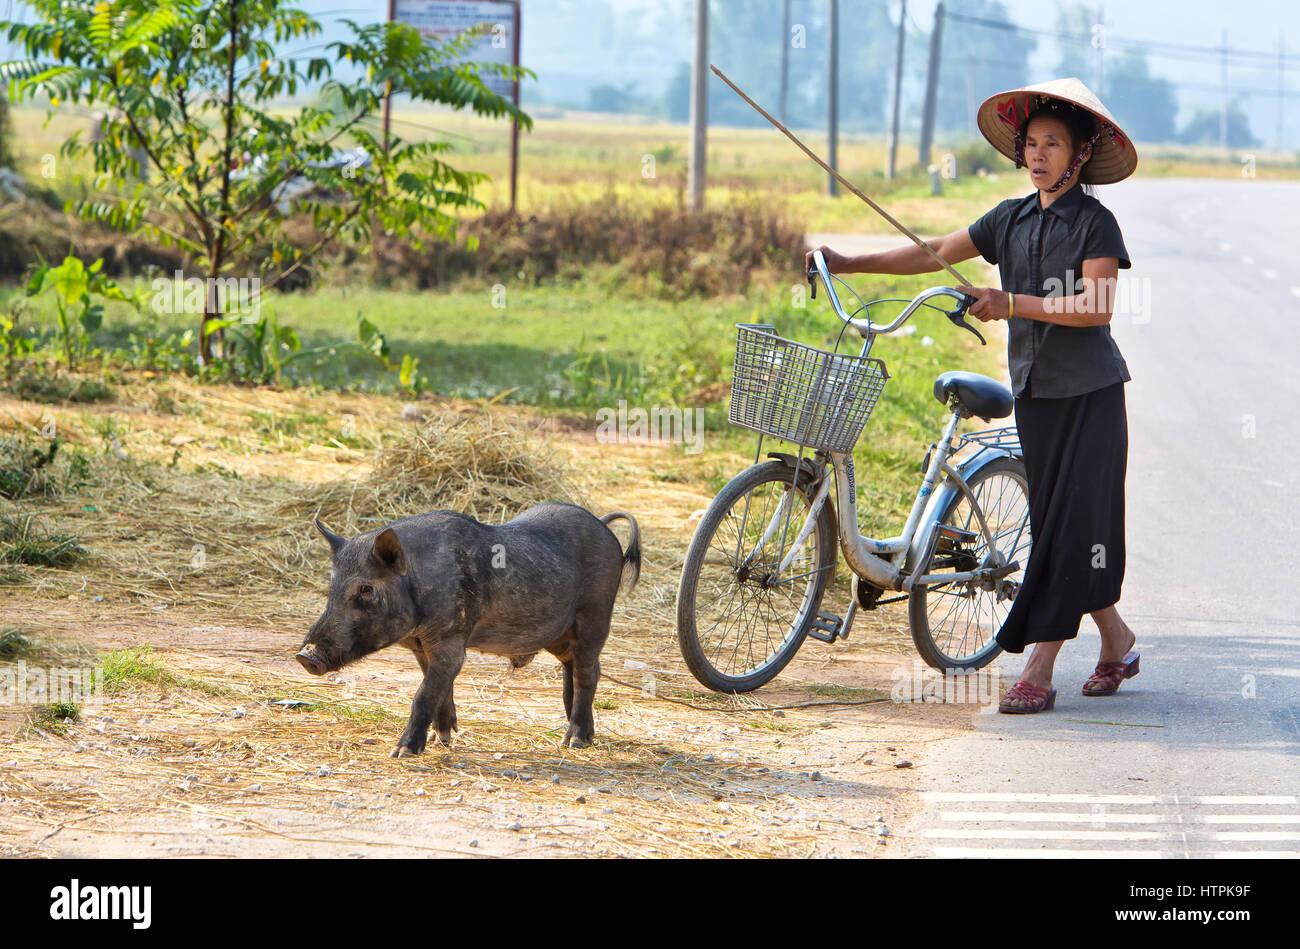 Farmer walking along roadway, guiding young pig. - Stock Image